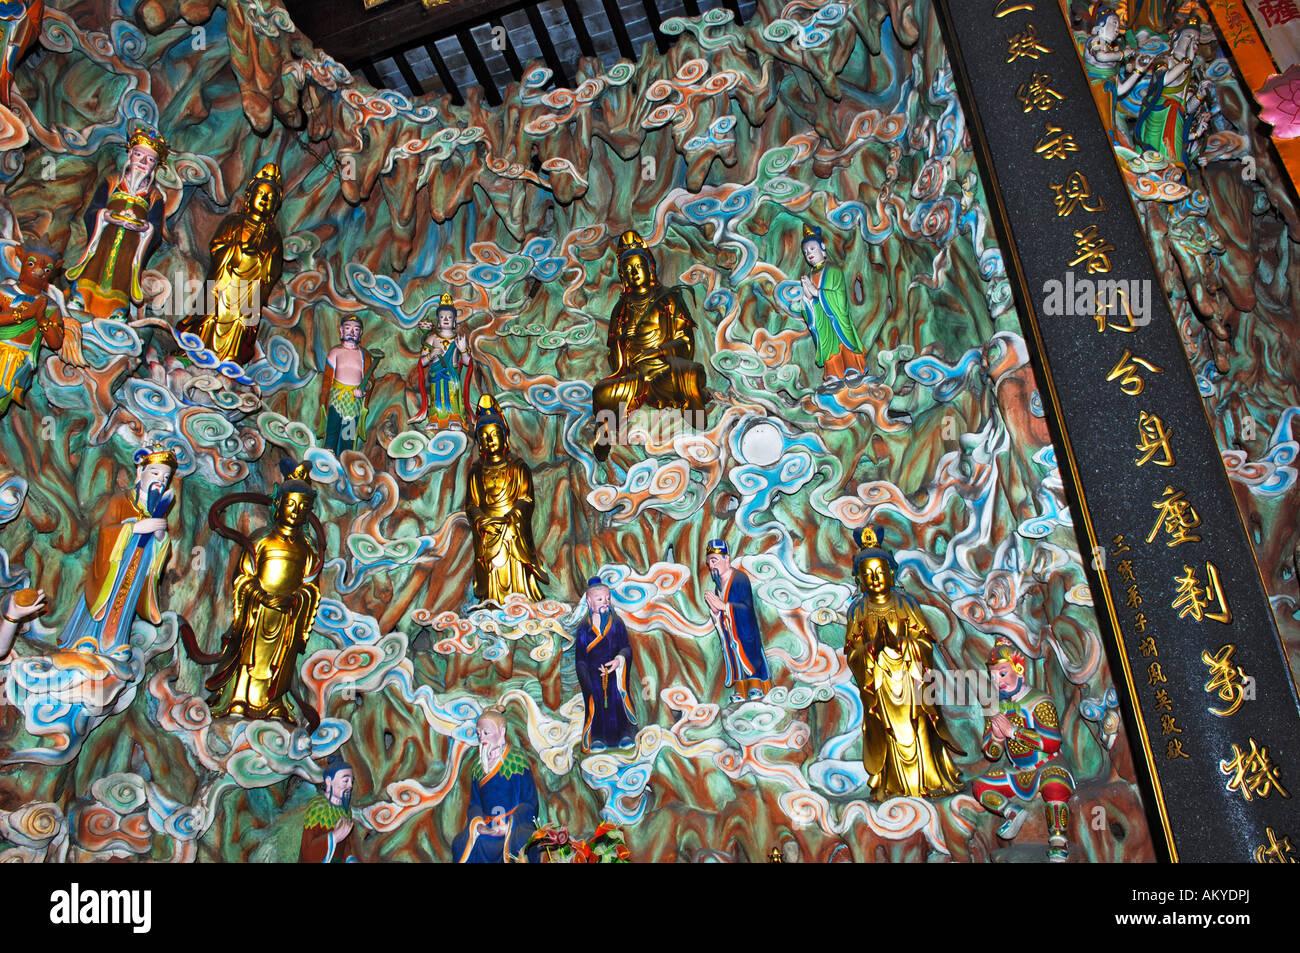 Figurines, gods' heaven, Longhua temple, Shanghai, China Stock Photo